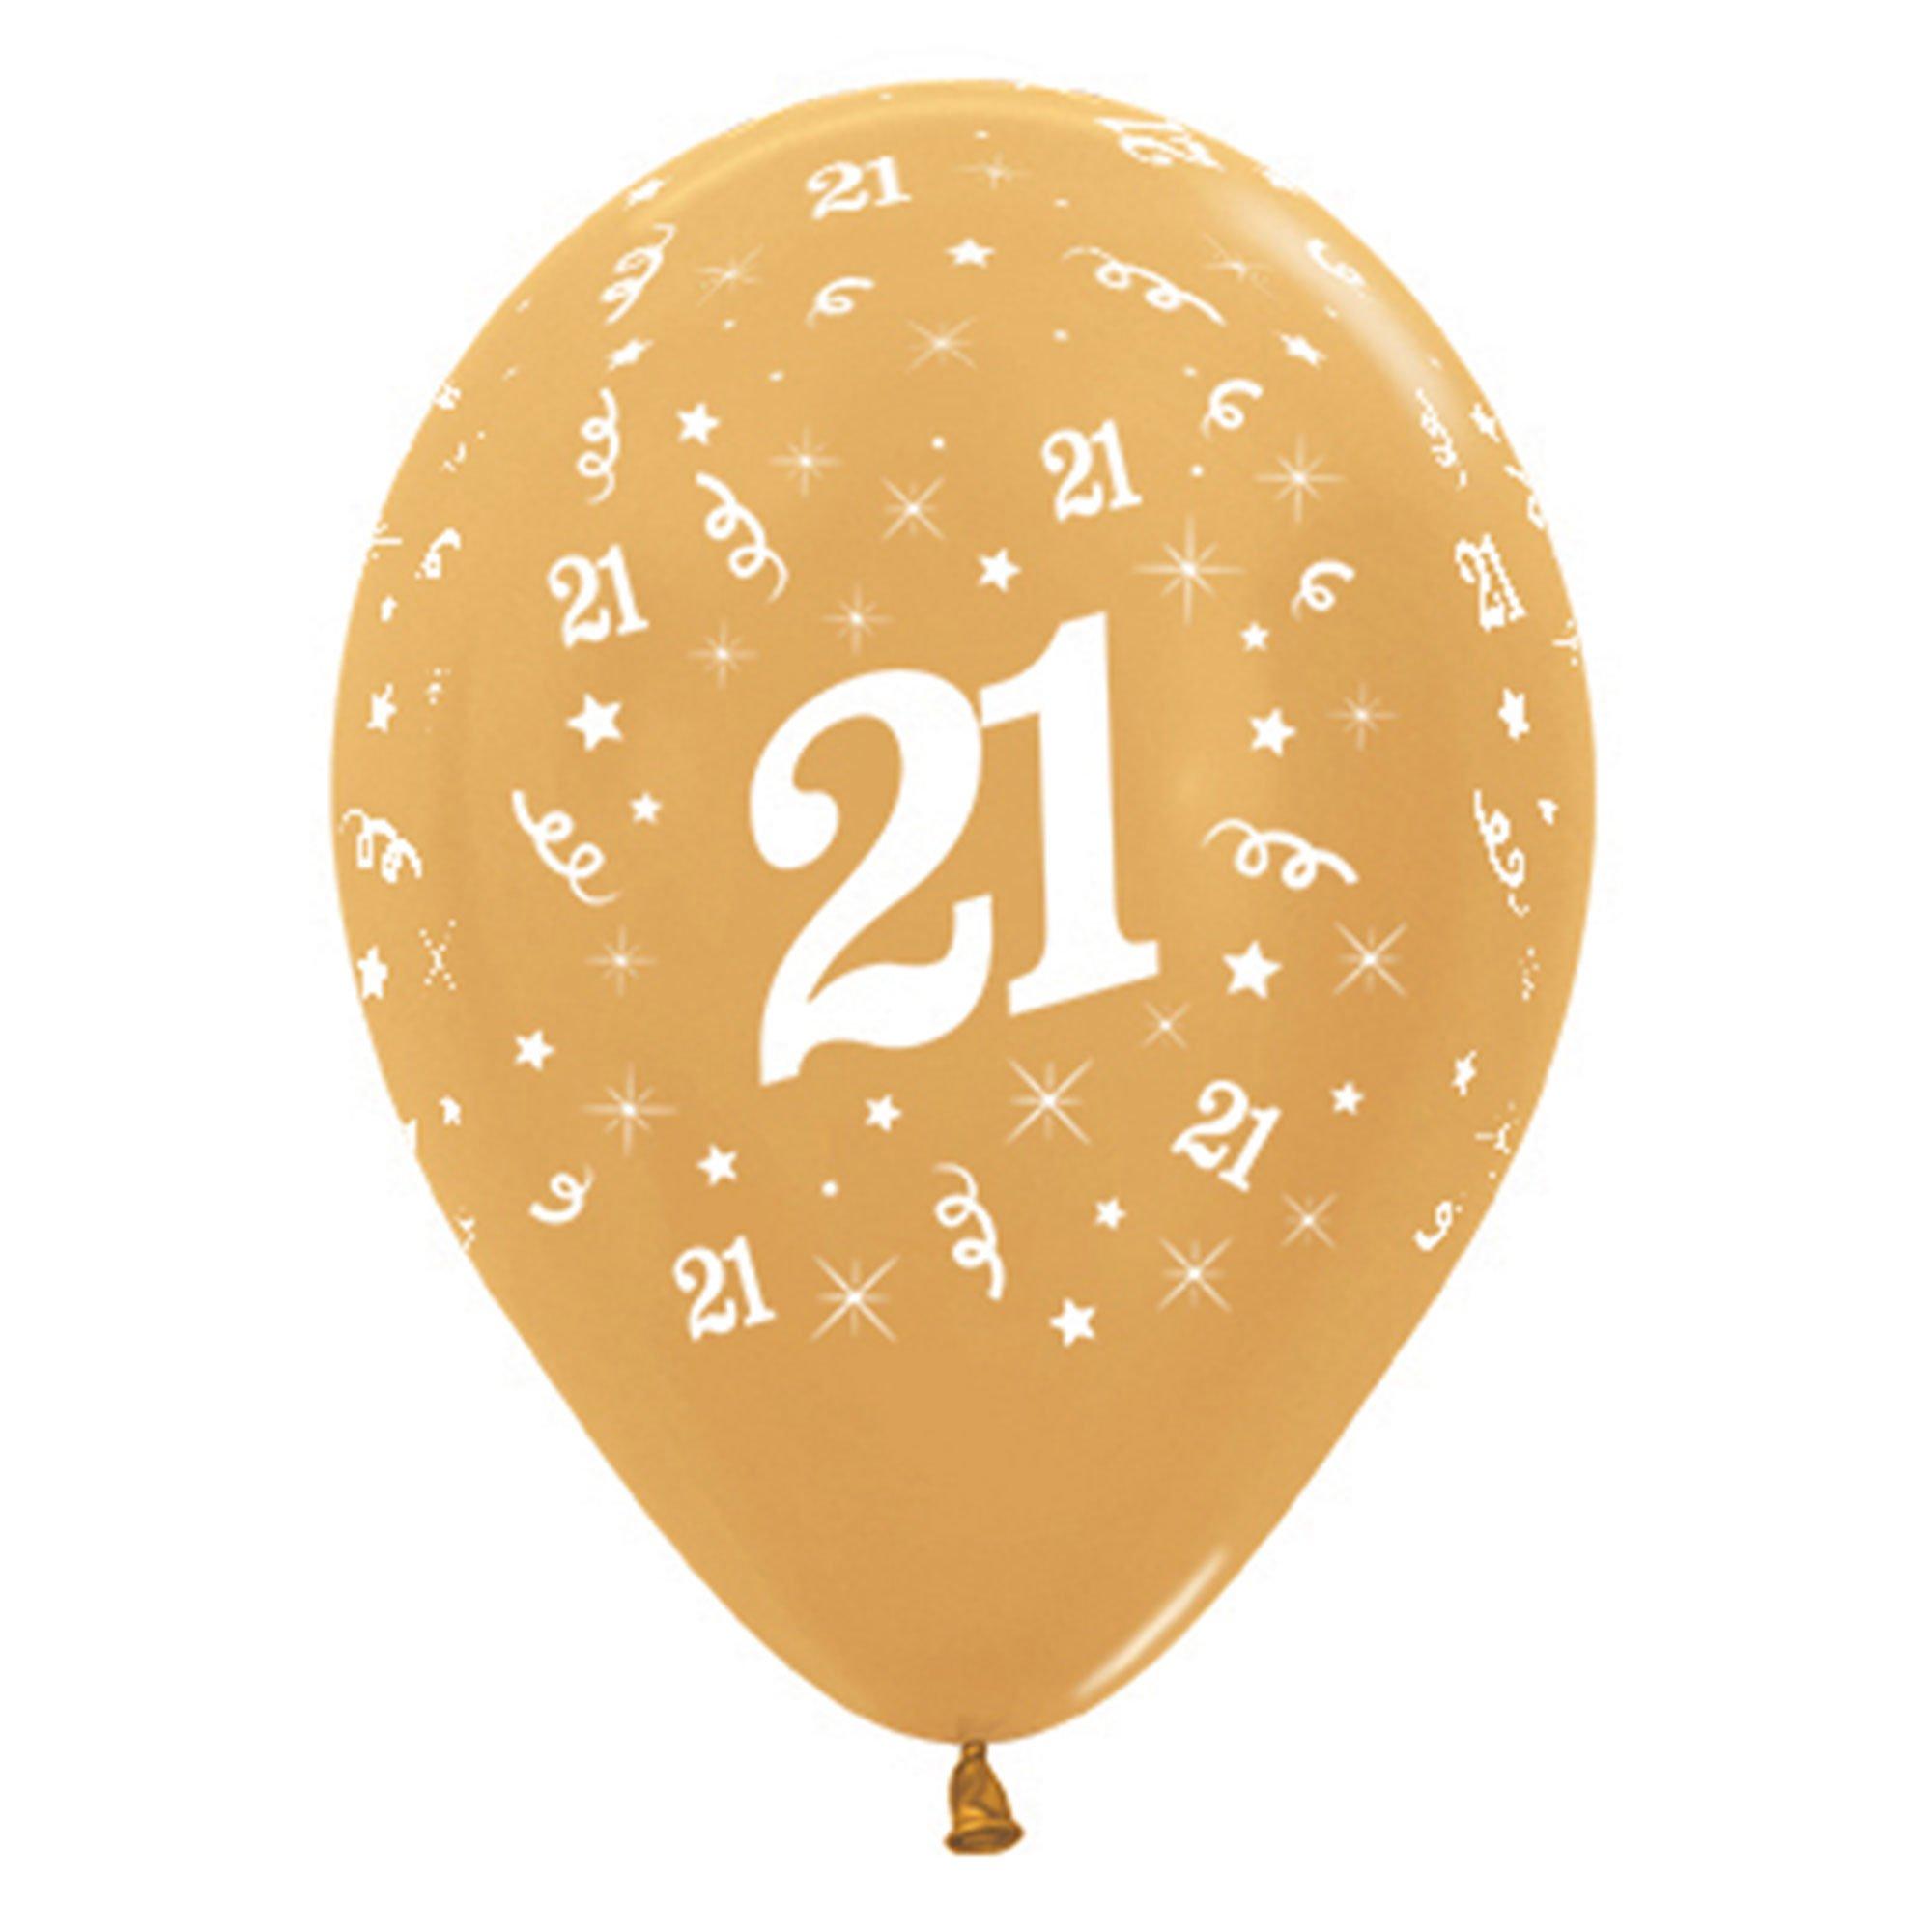 Sempertex 30cm Age 21 Metallic Gold Latex Balloons, 6PK